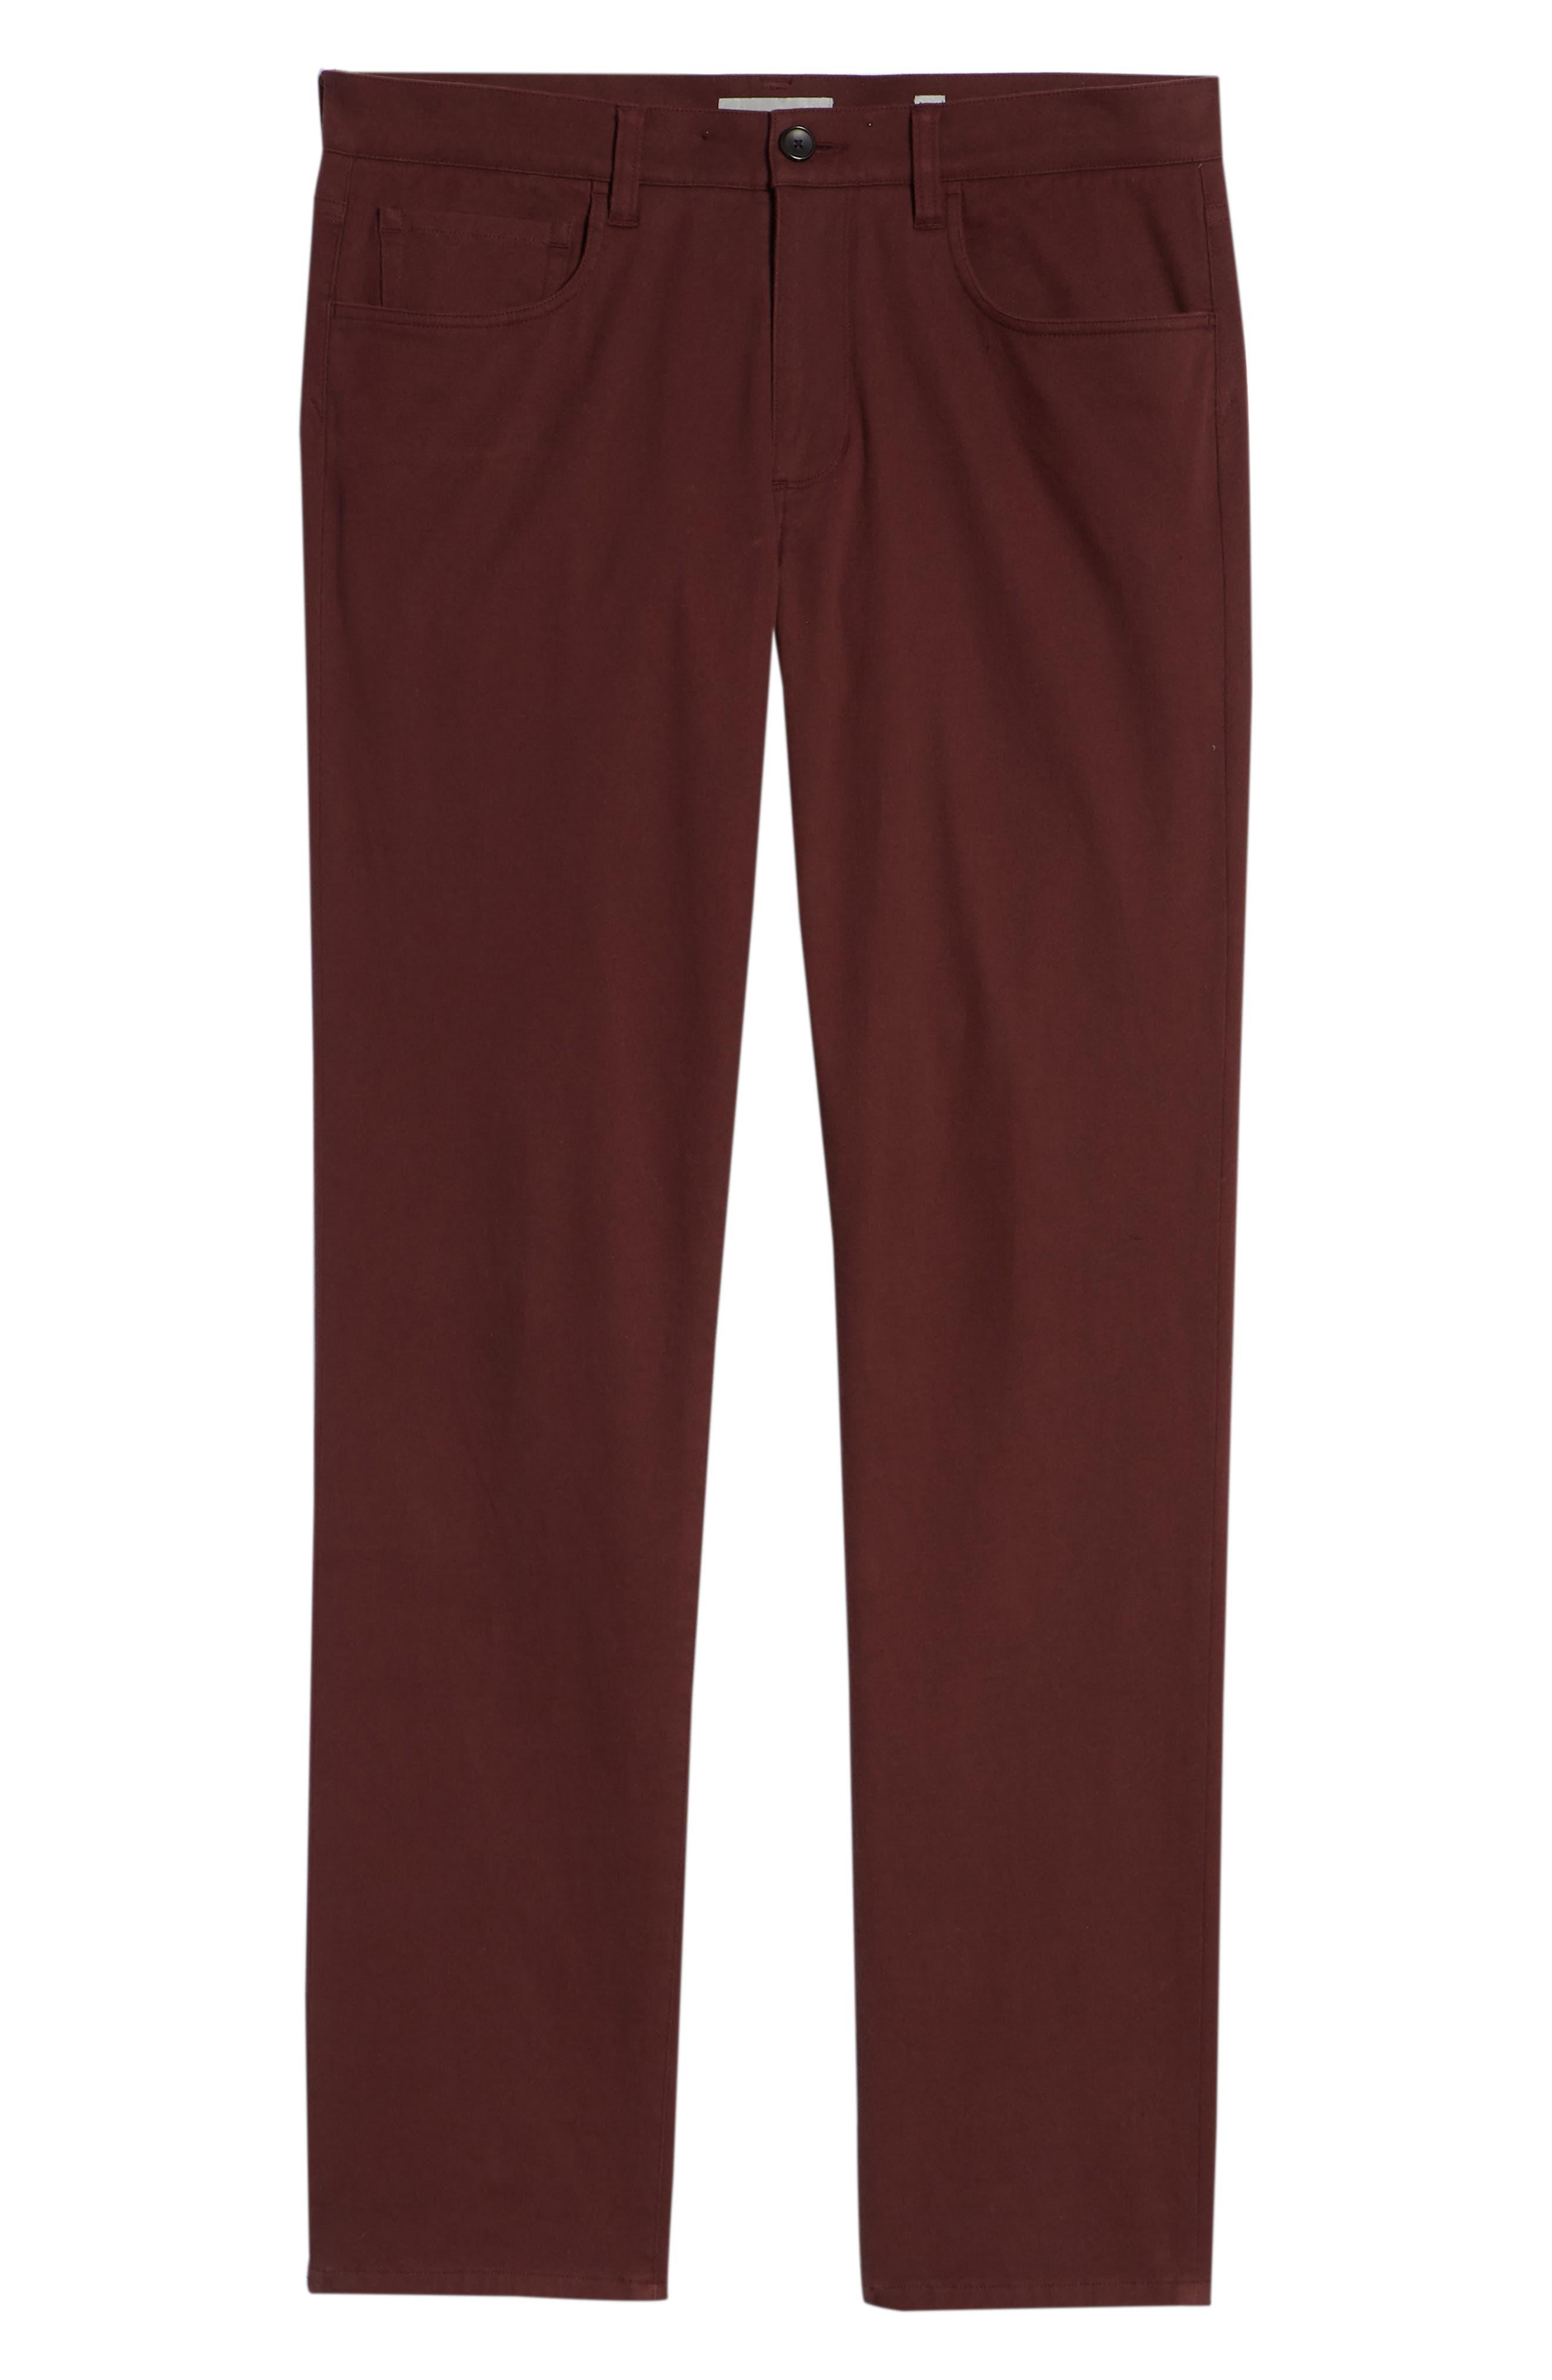 Regular Fit Five-Pocket Pants,                             Alternate thumbnail 12, color,